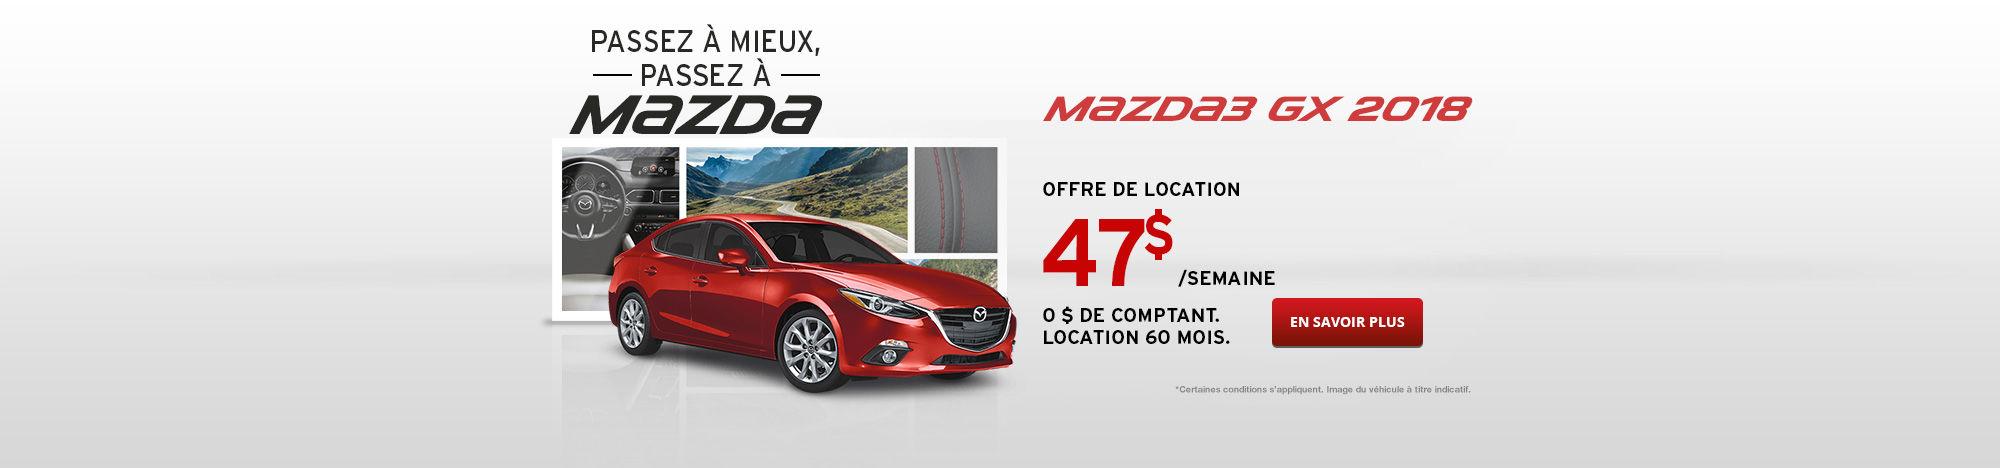 Passez à Mazda Septembre - Mazda3